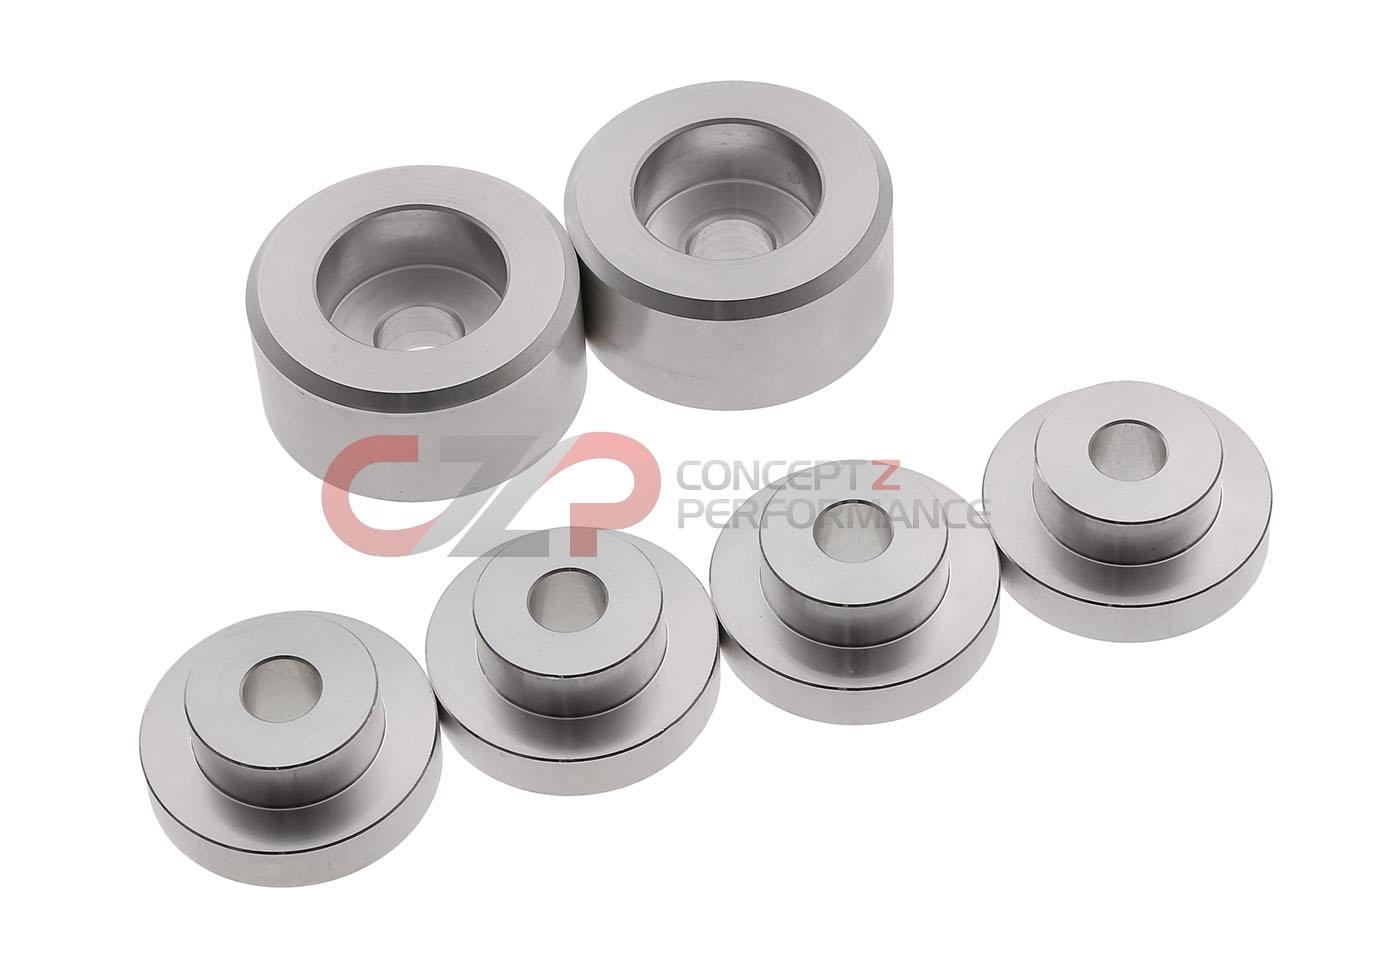 SPL Parts SPL Solid Differential Mounting Bushings - Nissan Skyline R32,  R33, R34 / 300ZX Z32 / 240SX 95-98 SPL SDB S14 - Concept Z Performance